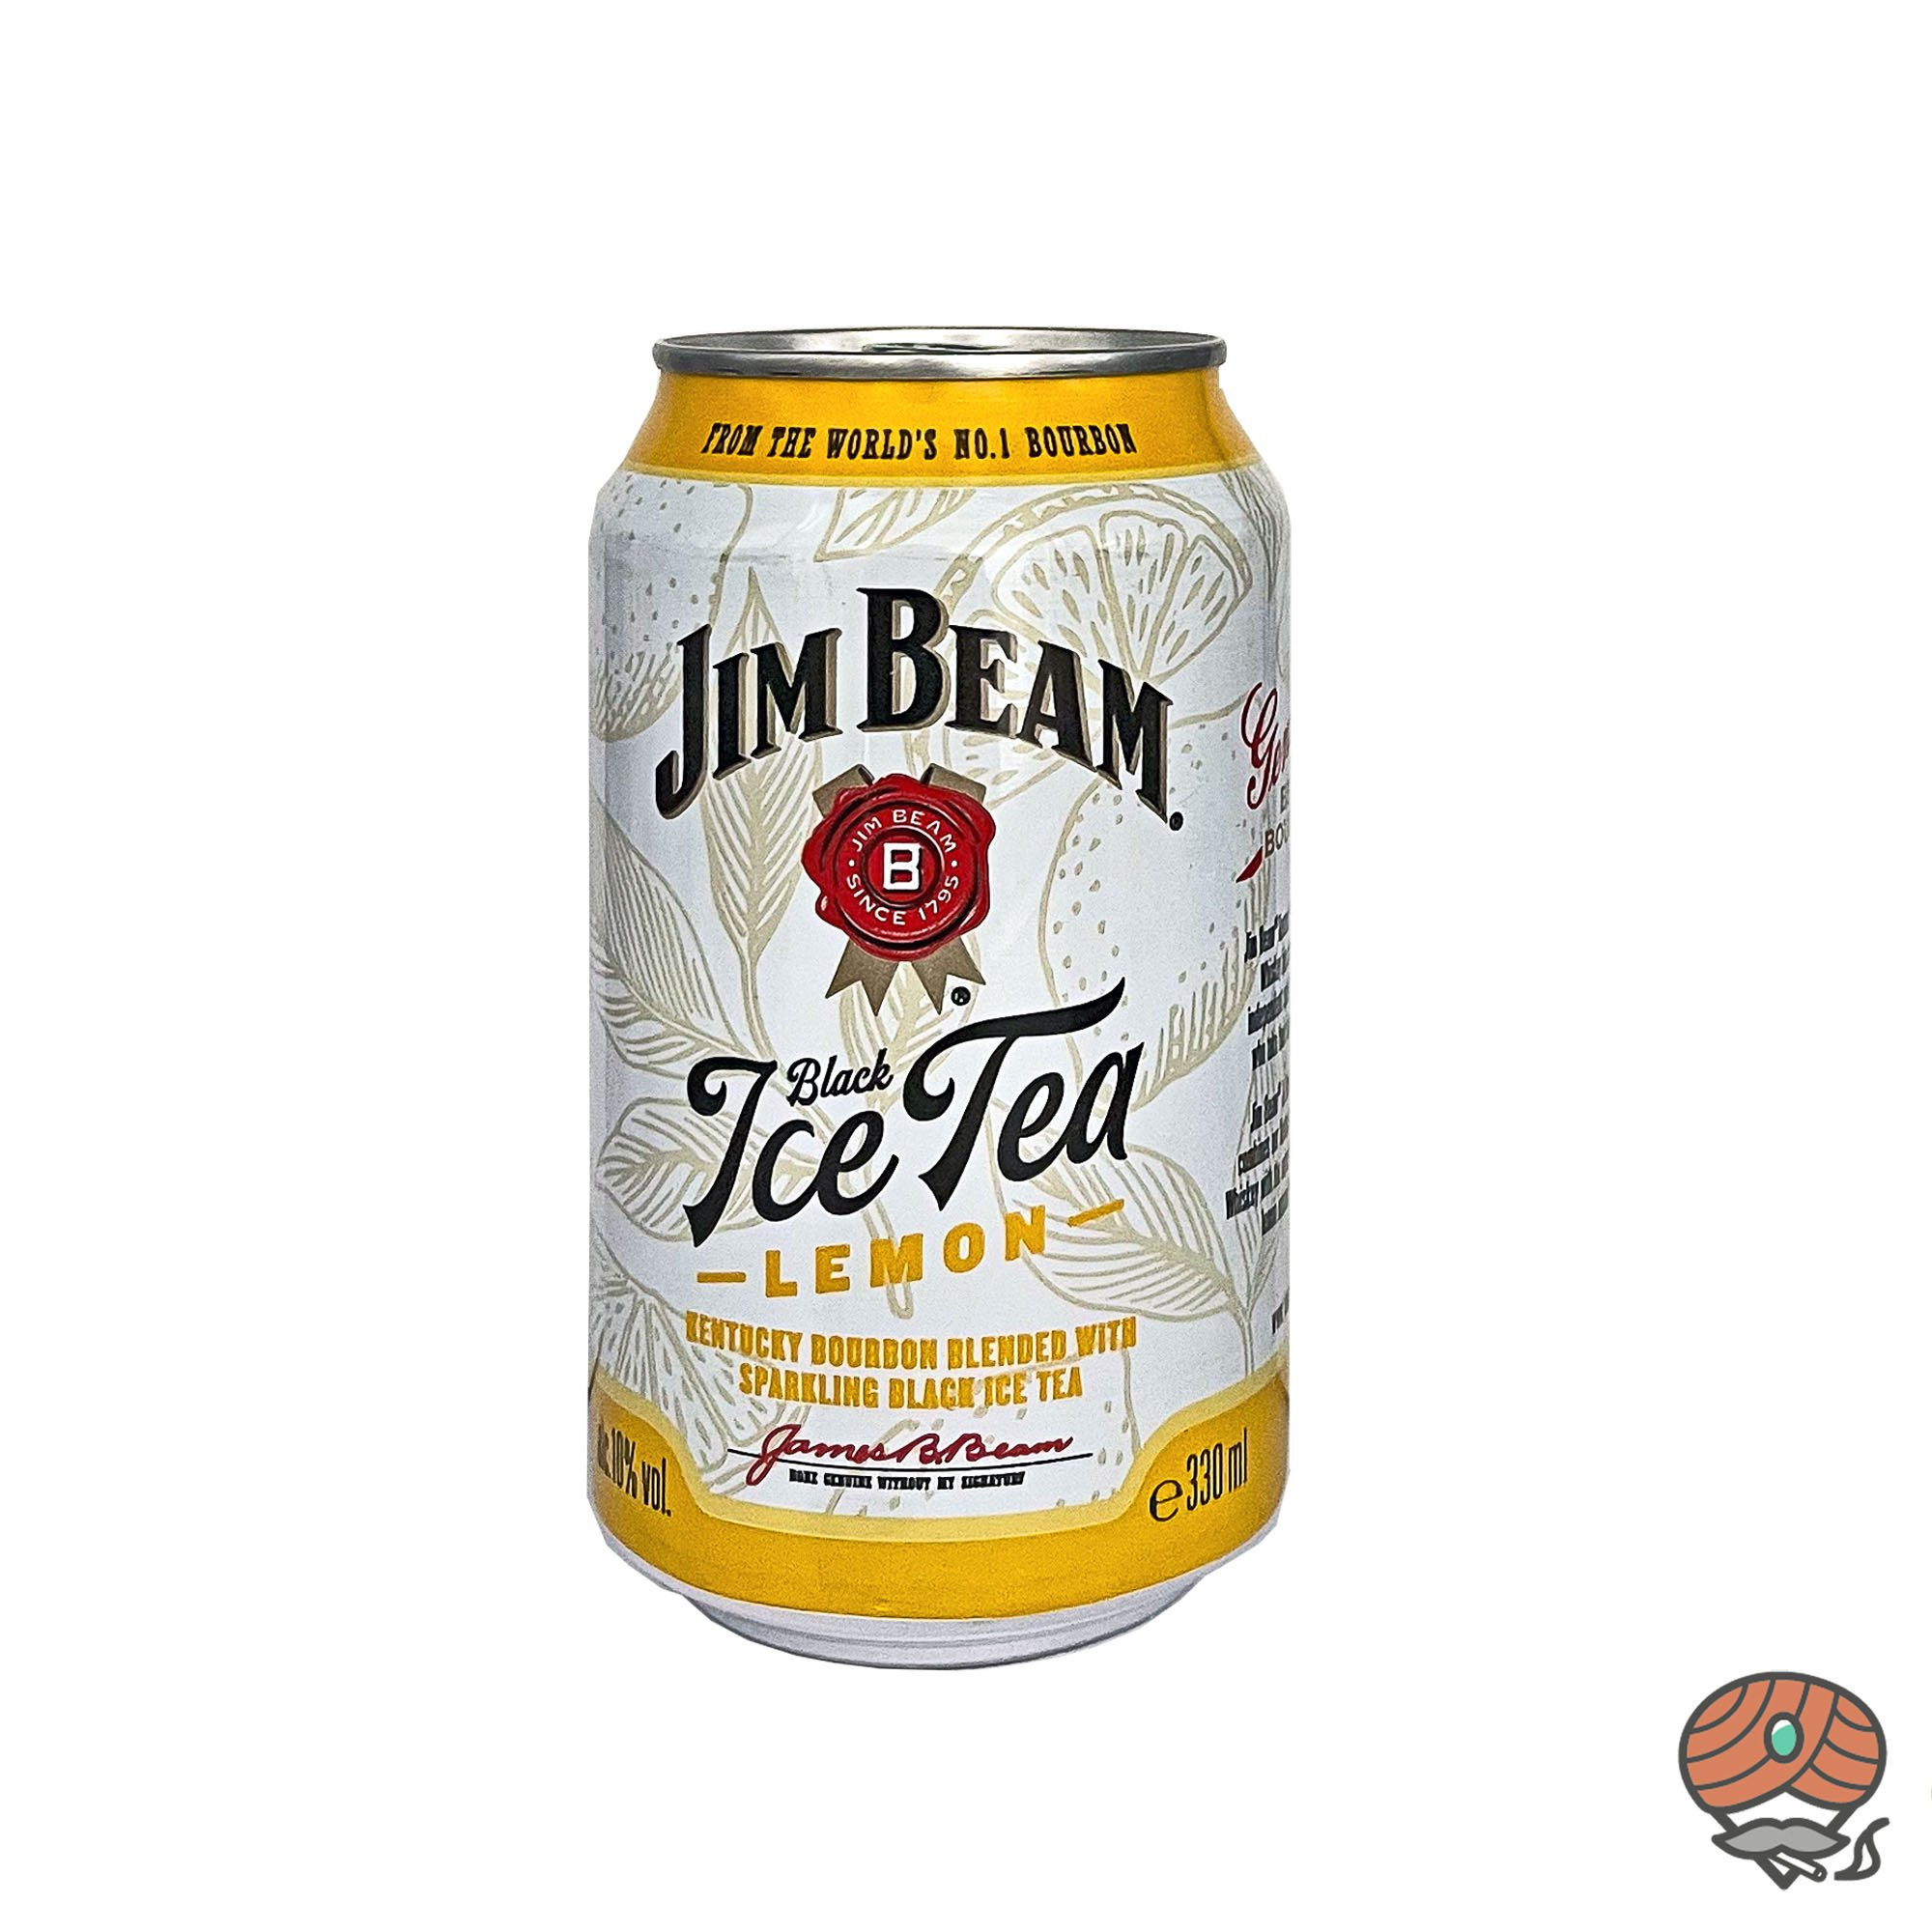 Jim Beam Whiskey + Black Ice Tea 0,33 l inkl.0,25 Euro Pfand (alc. 10% Vol)